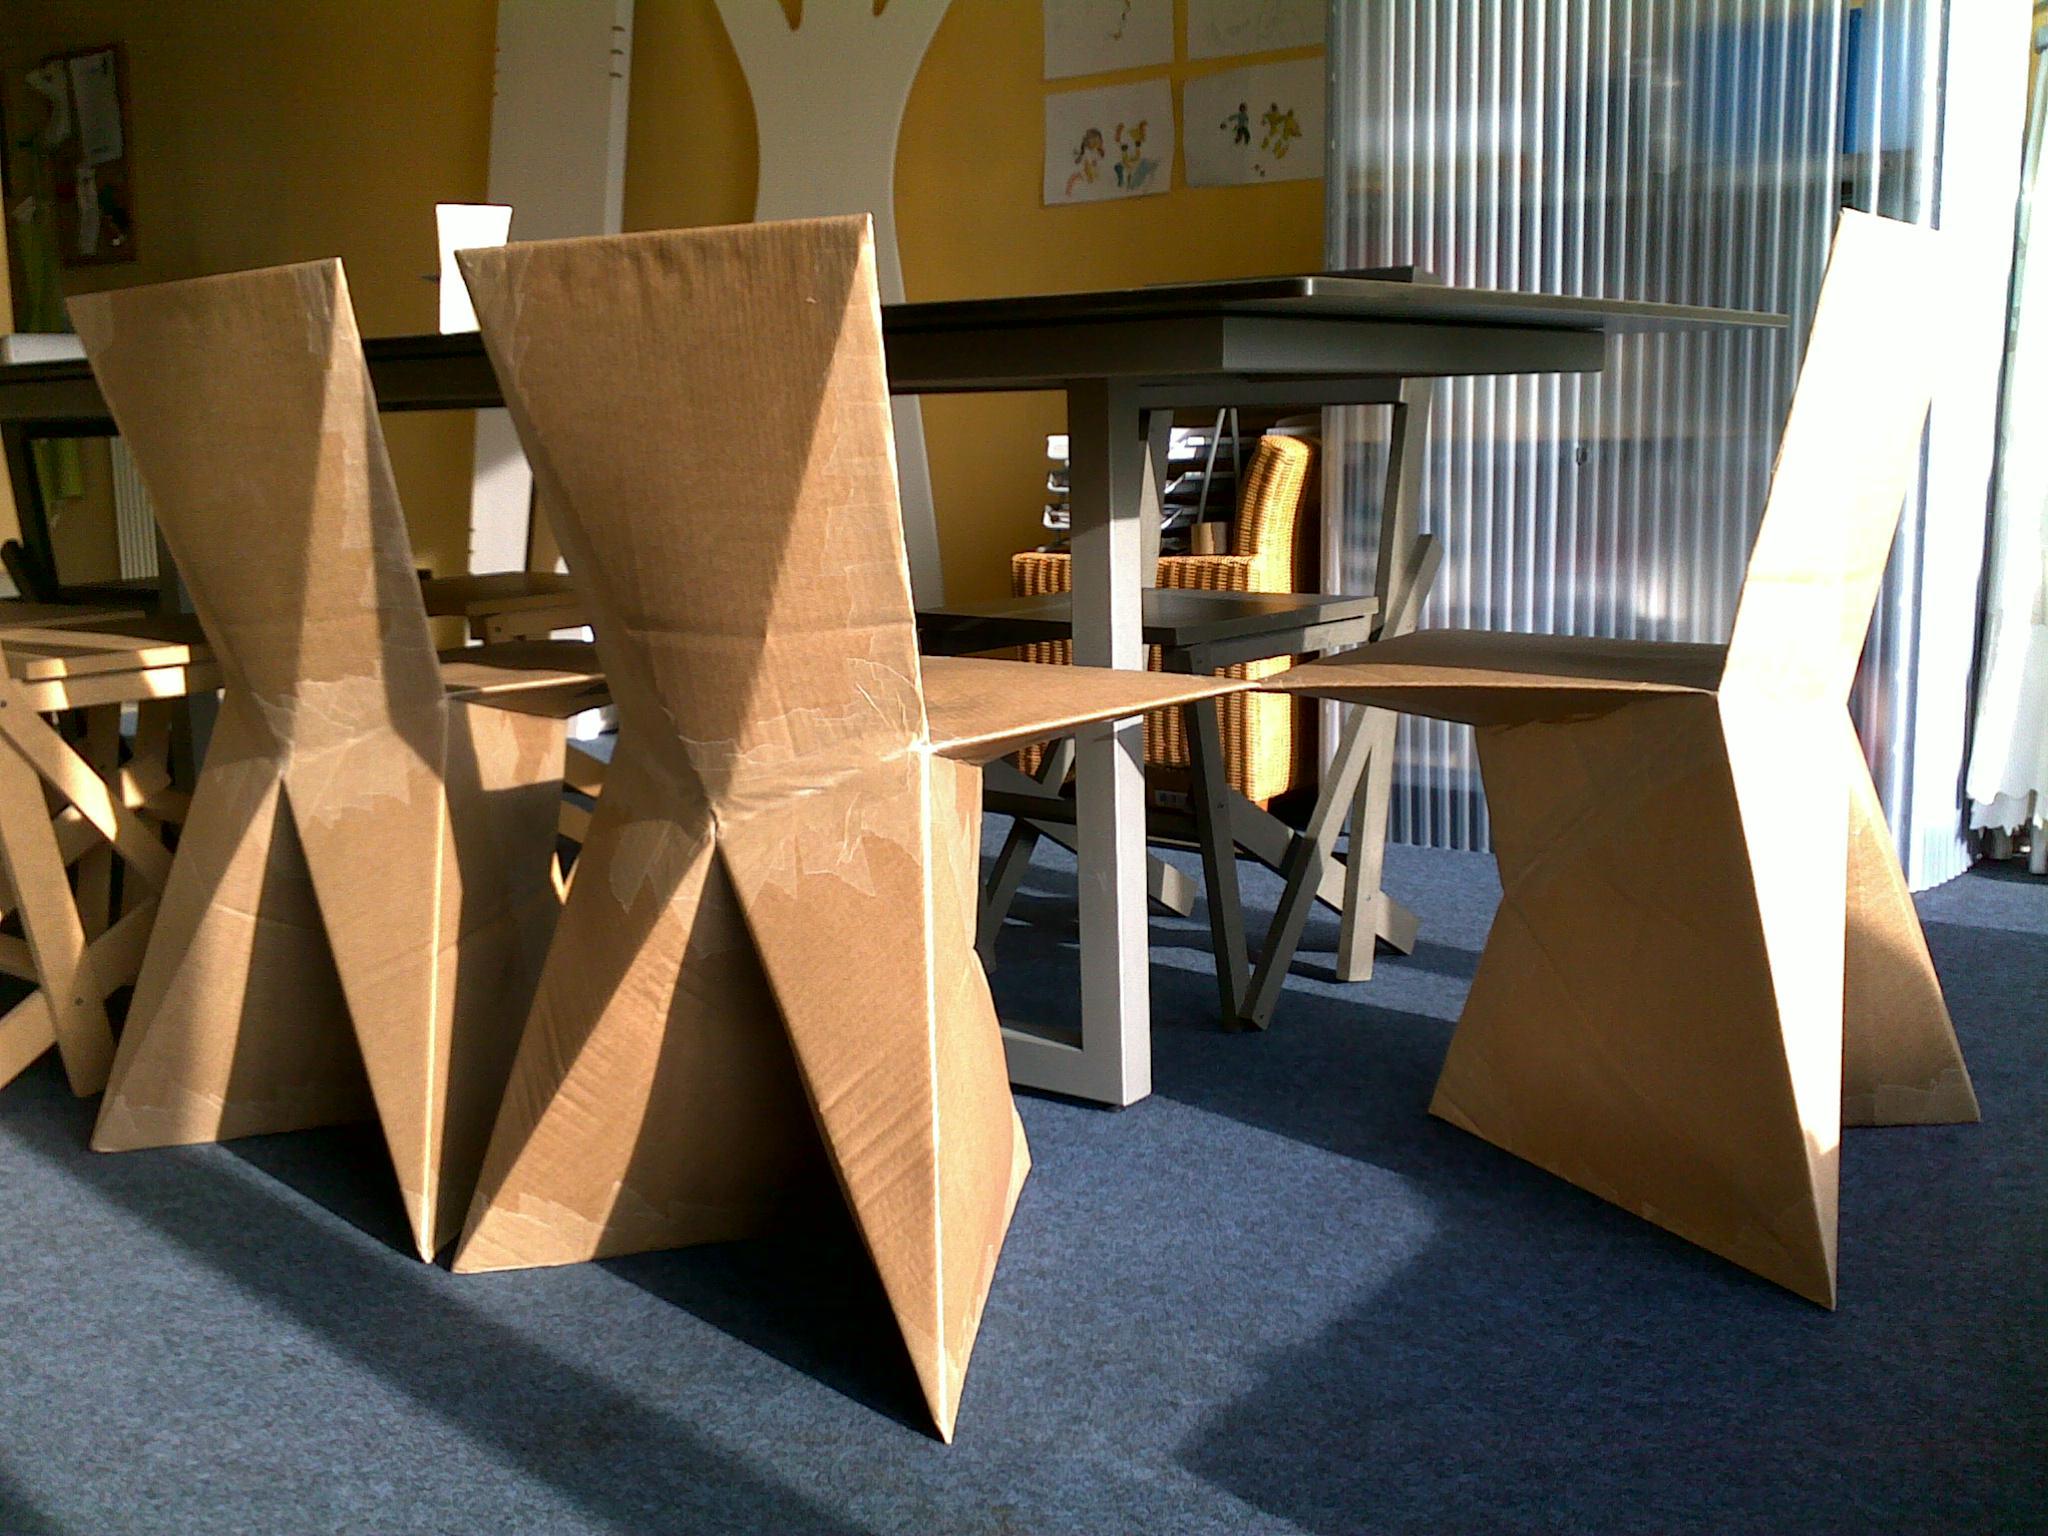 Diy cardboard furniture Carton Diy Cardboard Furniture House Chairs Decor Or Design 23 Cardboard Furniture Diy witch Pictures Decor Or Design